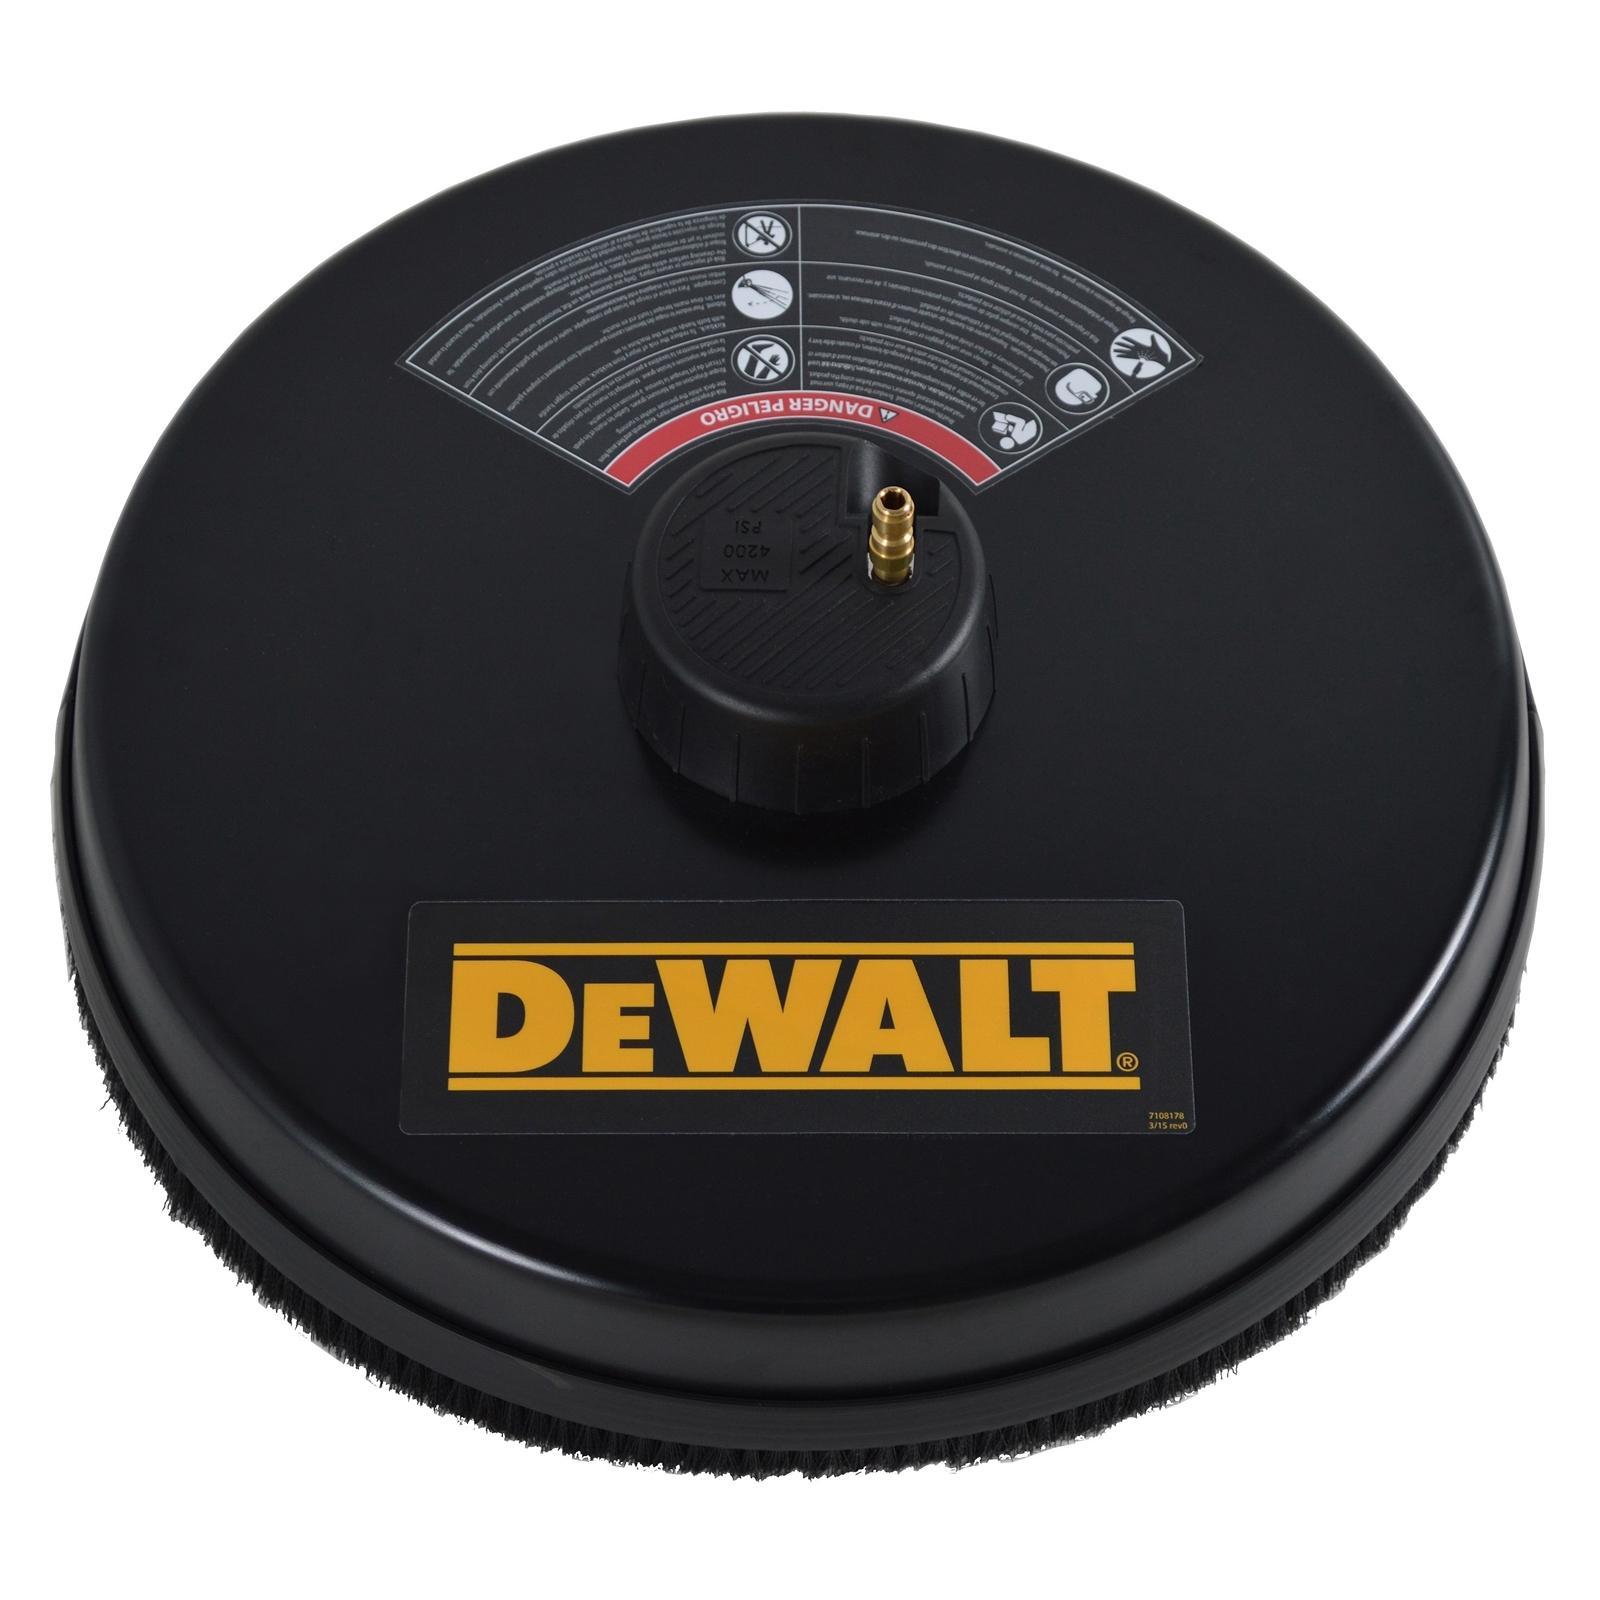 DeWALT 3600psi Surface Cleaner - Pressure Washer Accessory